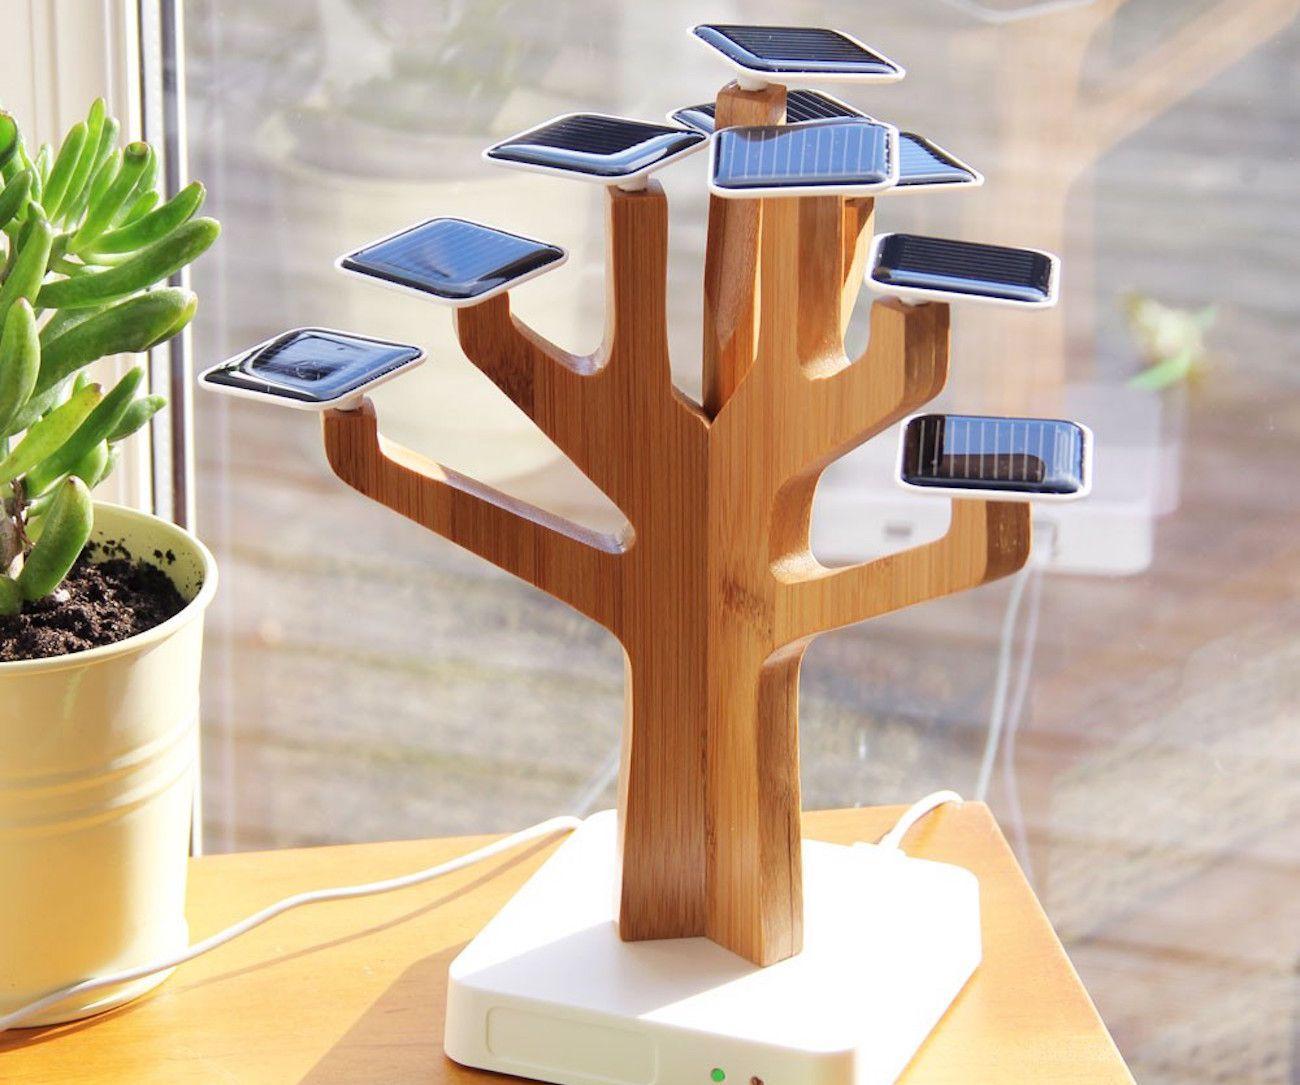 Solar SunTree Batterien Ladegerät Power Bank für Mobiltelefone, kreative Solarstree Ladungslebensbaum Home Decoration Geschenkgrafik